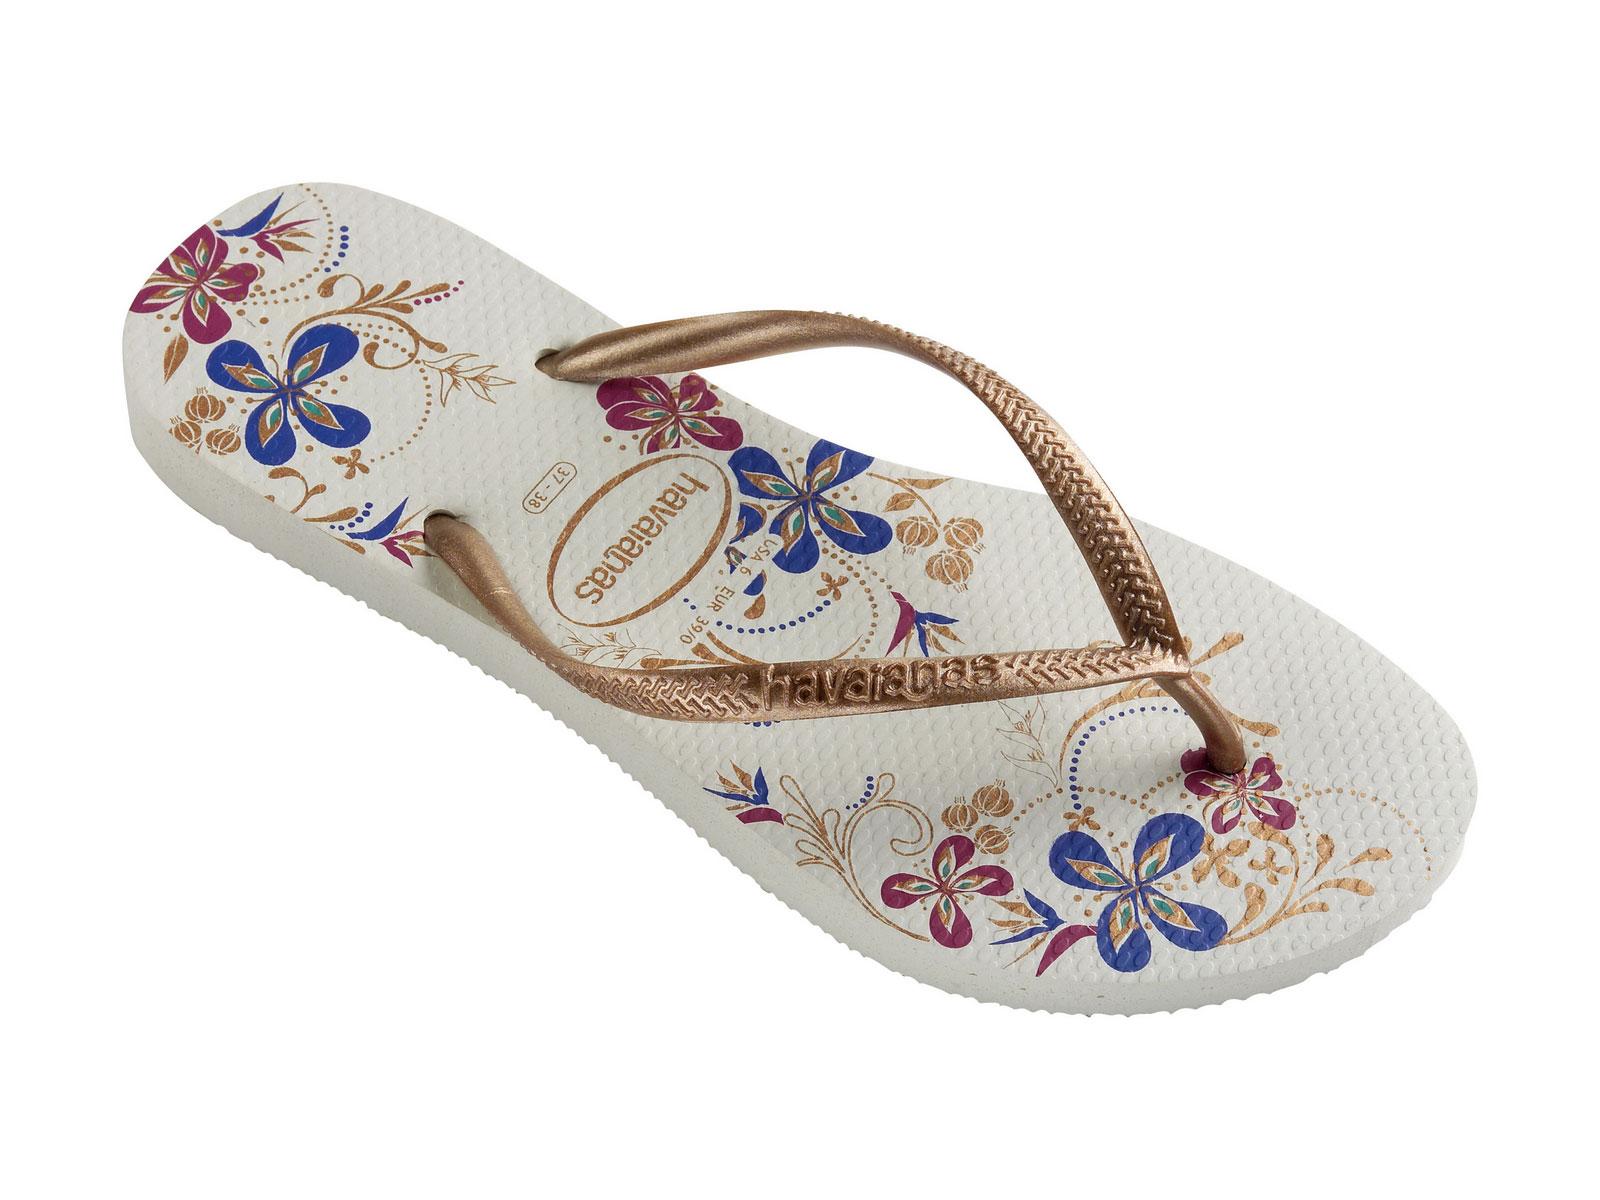 havaianas flip flops slim season white rose gold. Black Bedroom Furniture Sets. Home Design Ideas